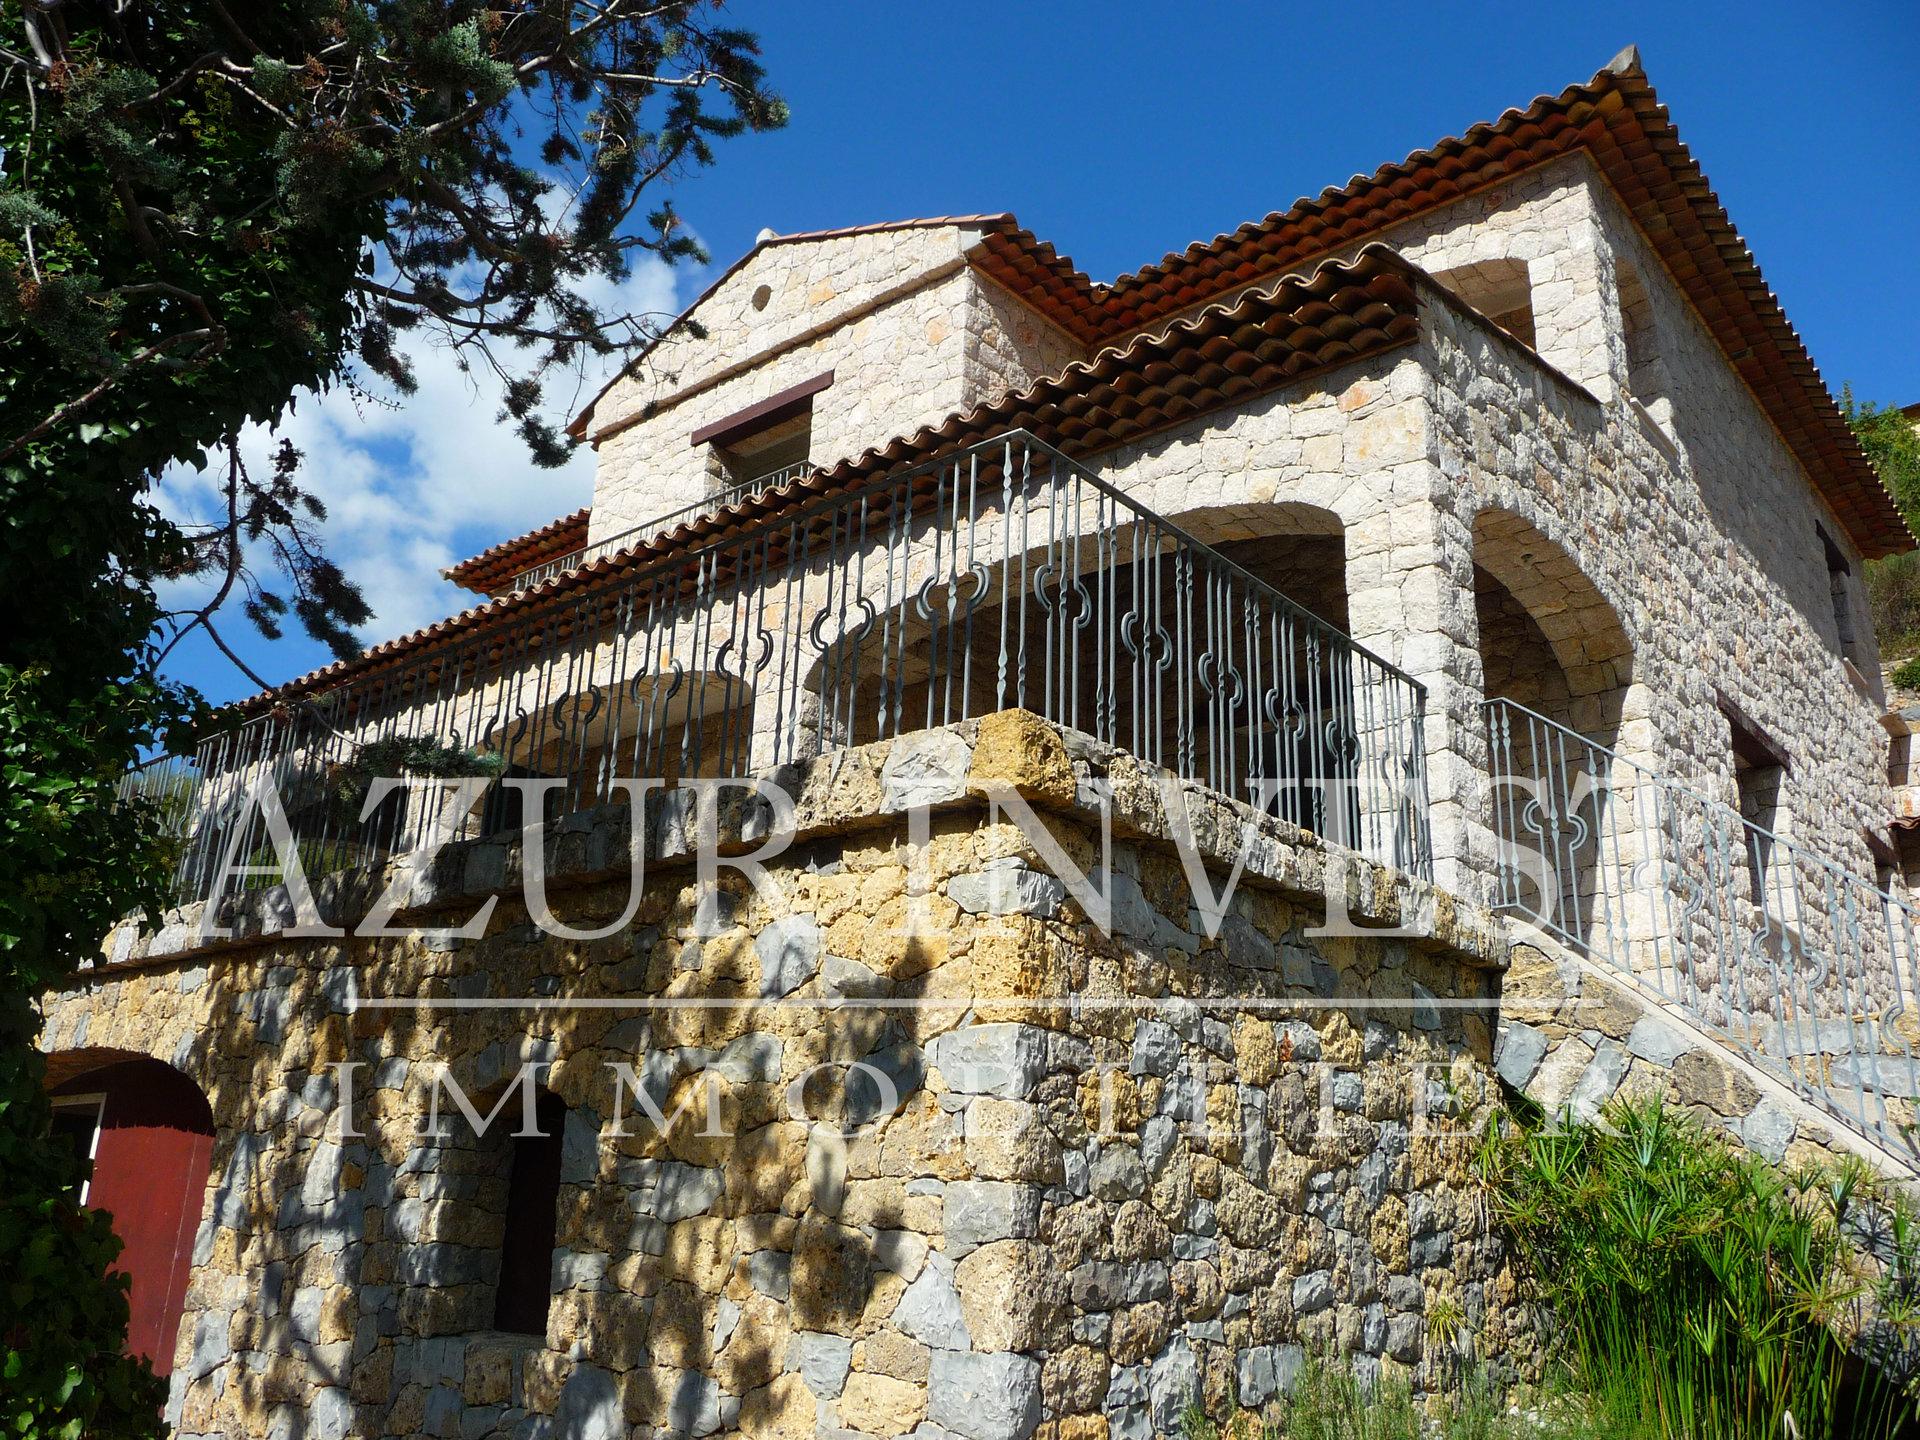 Продажа Бастид, типичный южный дом - Sospel